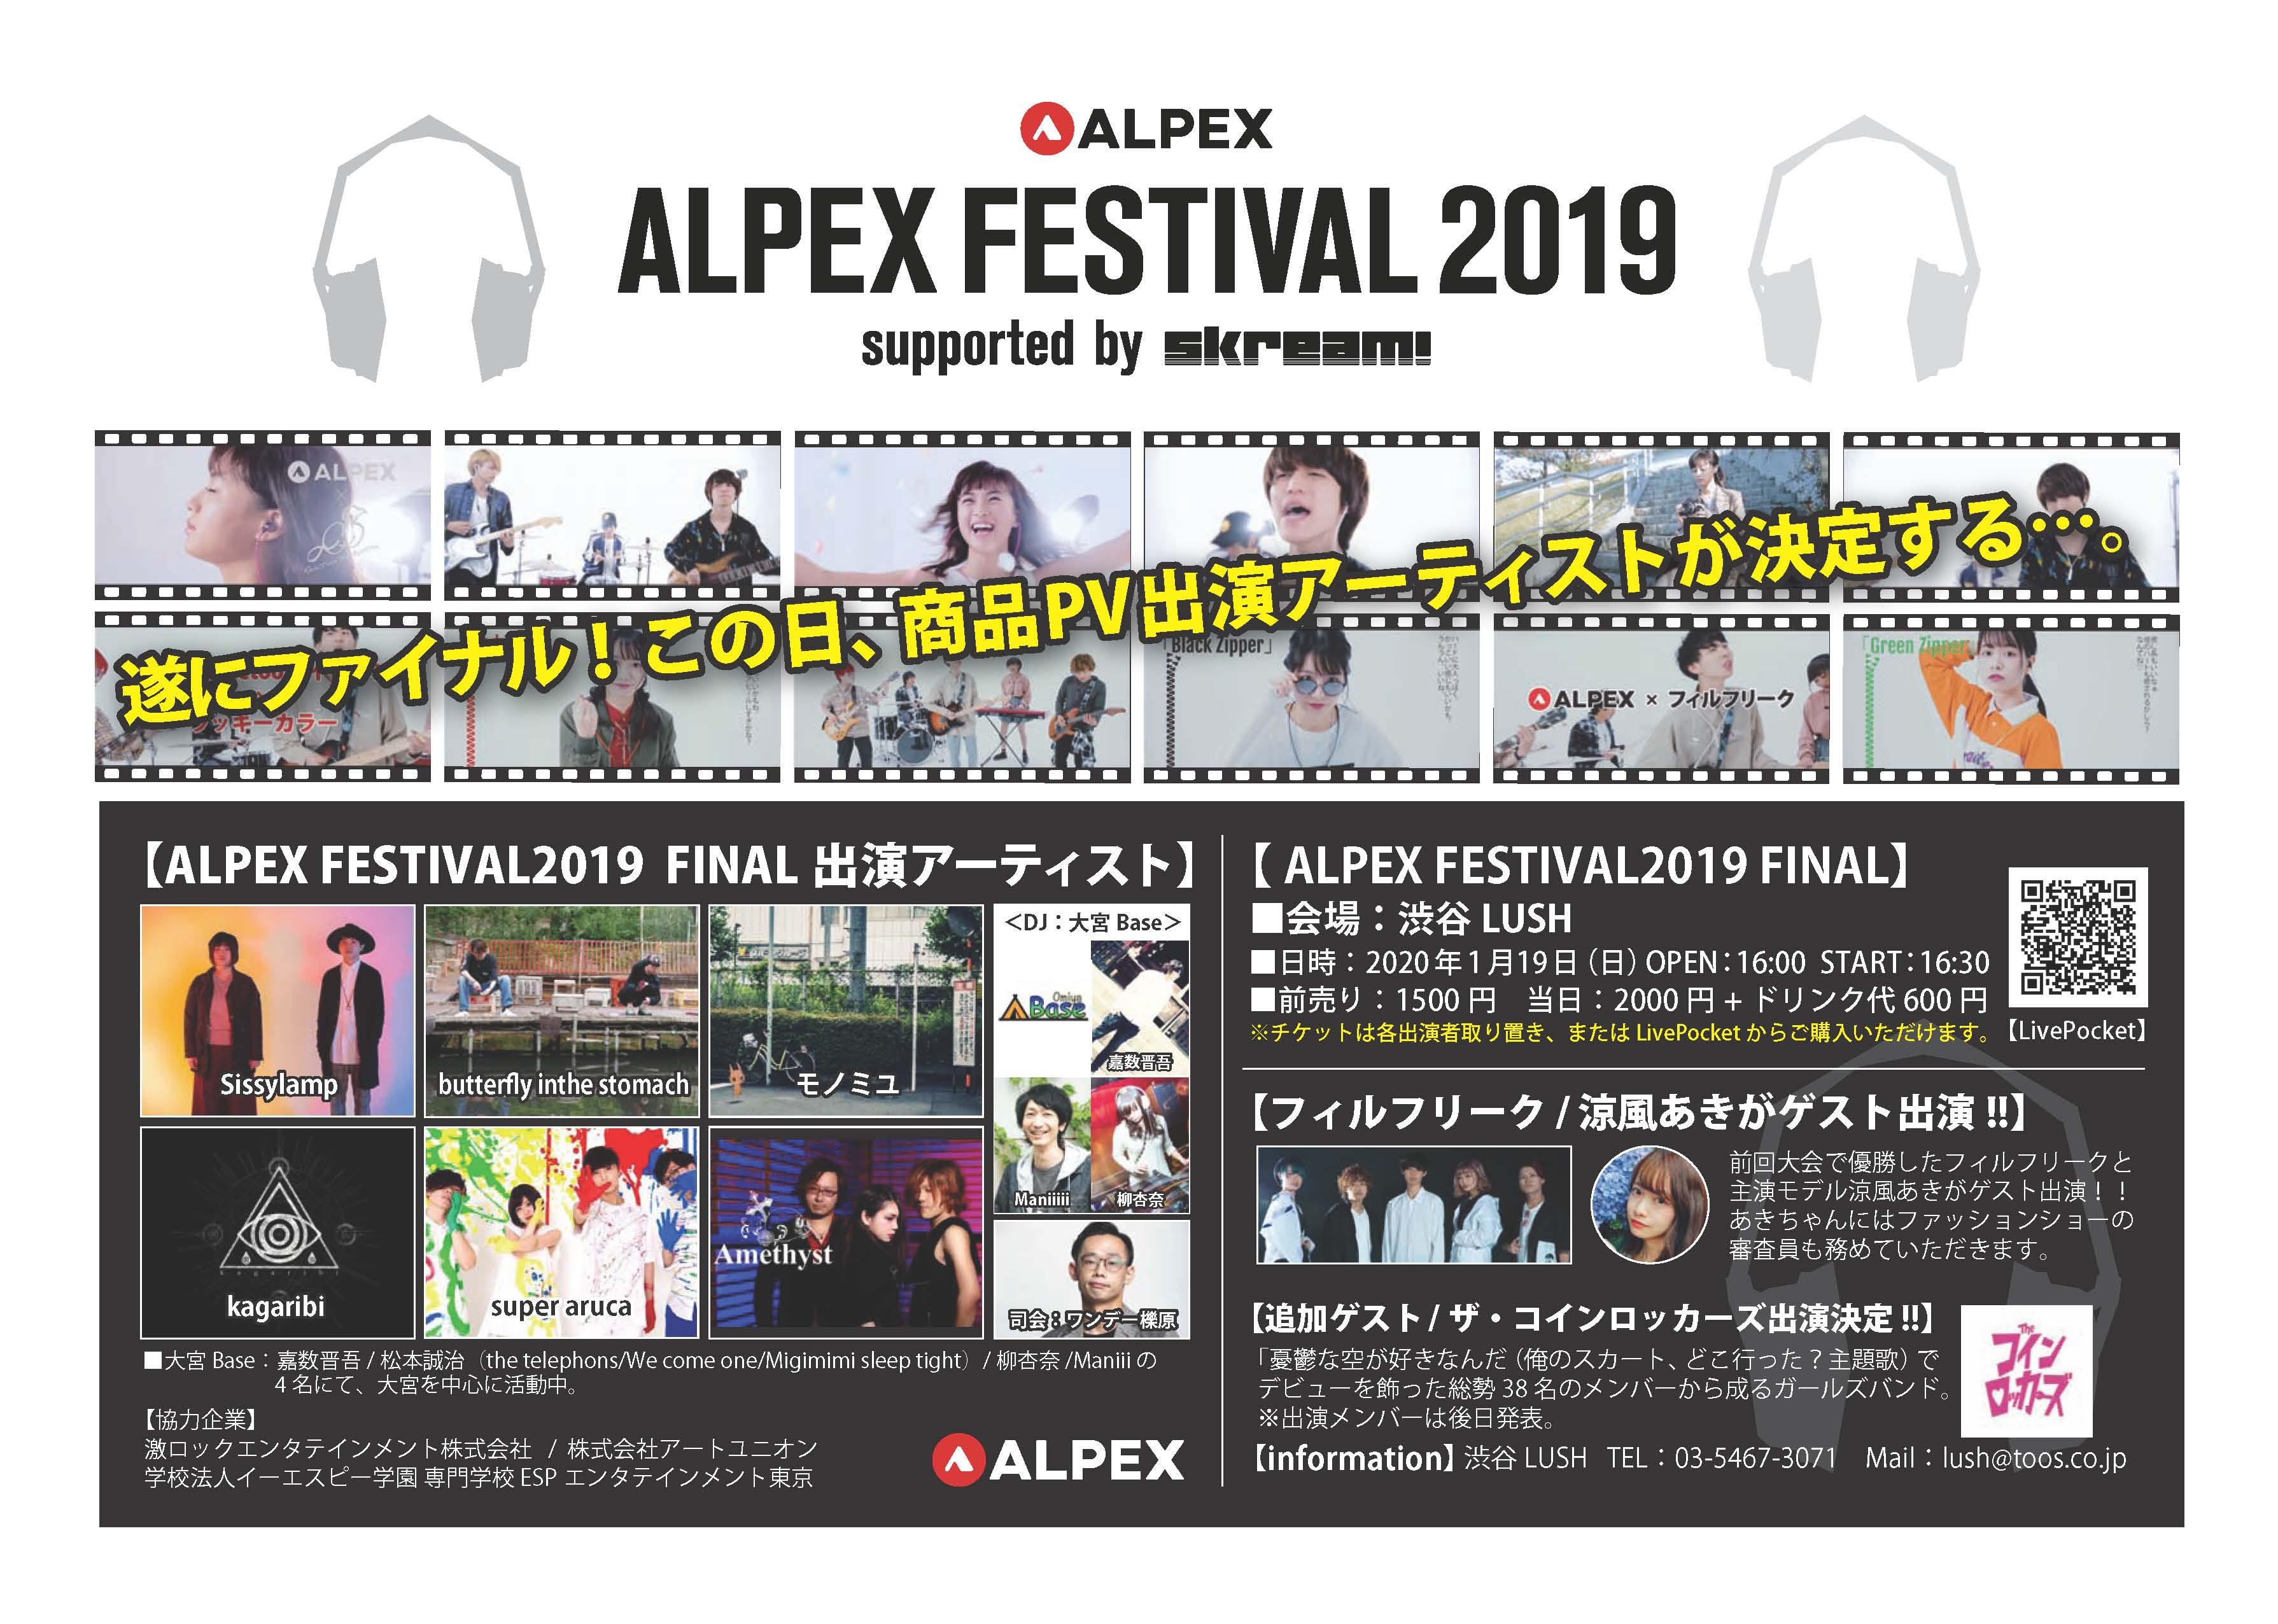 ALPEX FESTIVAL2019 FINAL